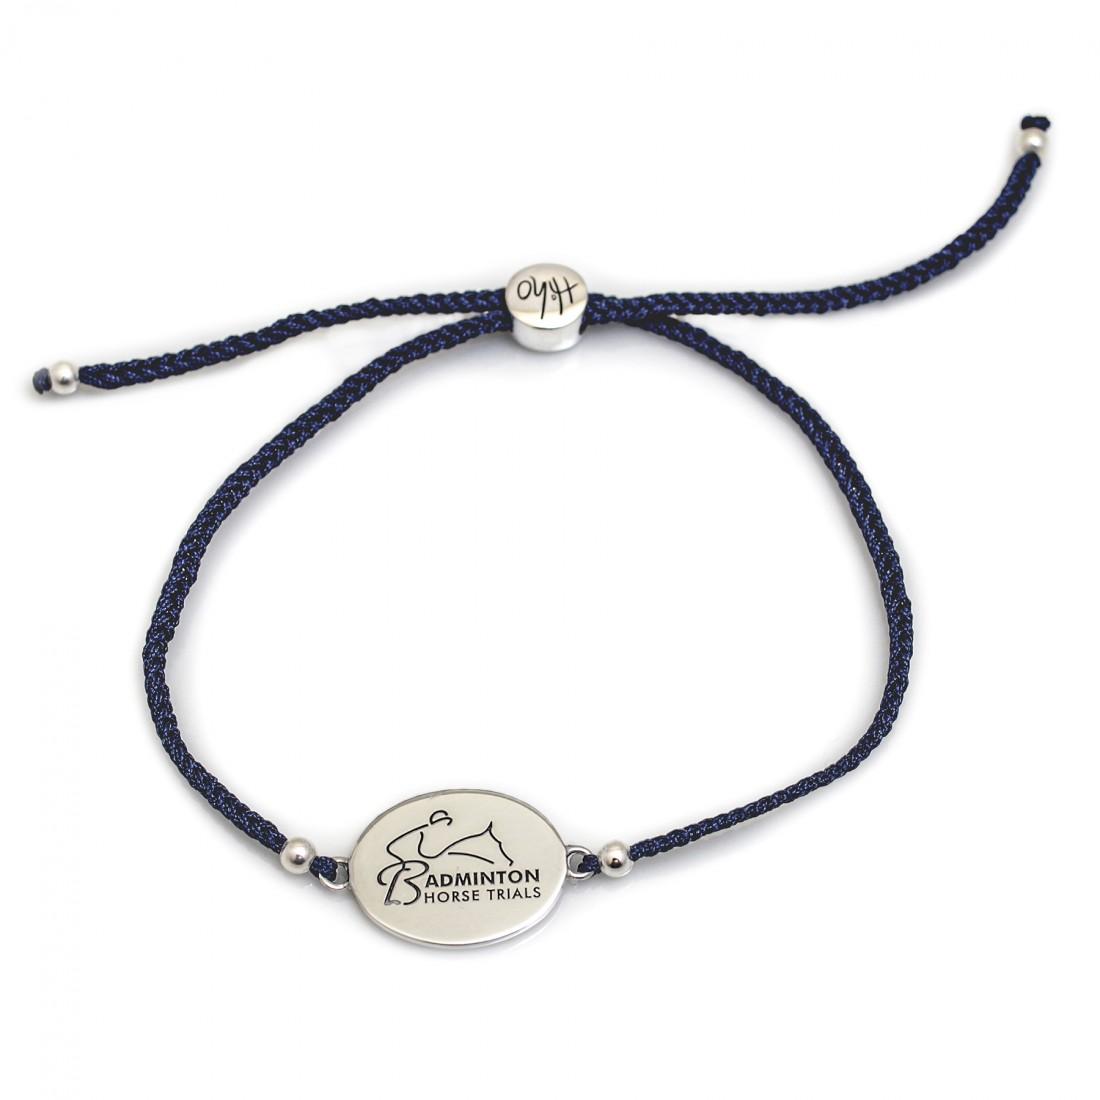 Exclusive Sterling Silver Badminton Horse Trials Friendship Bracelet